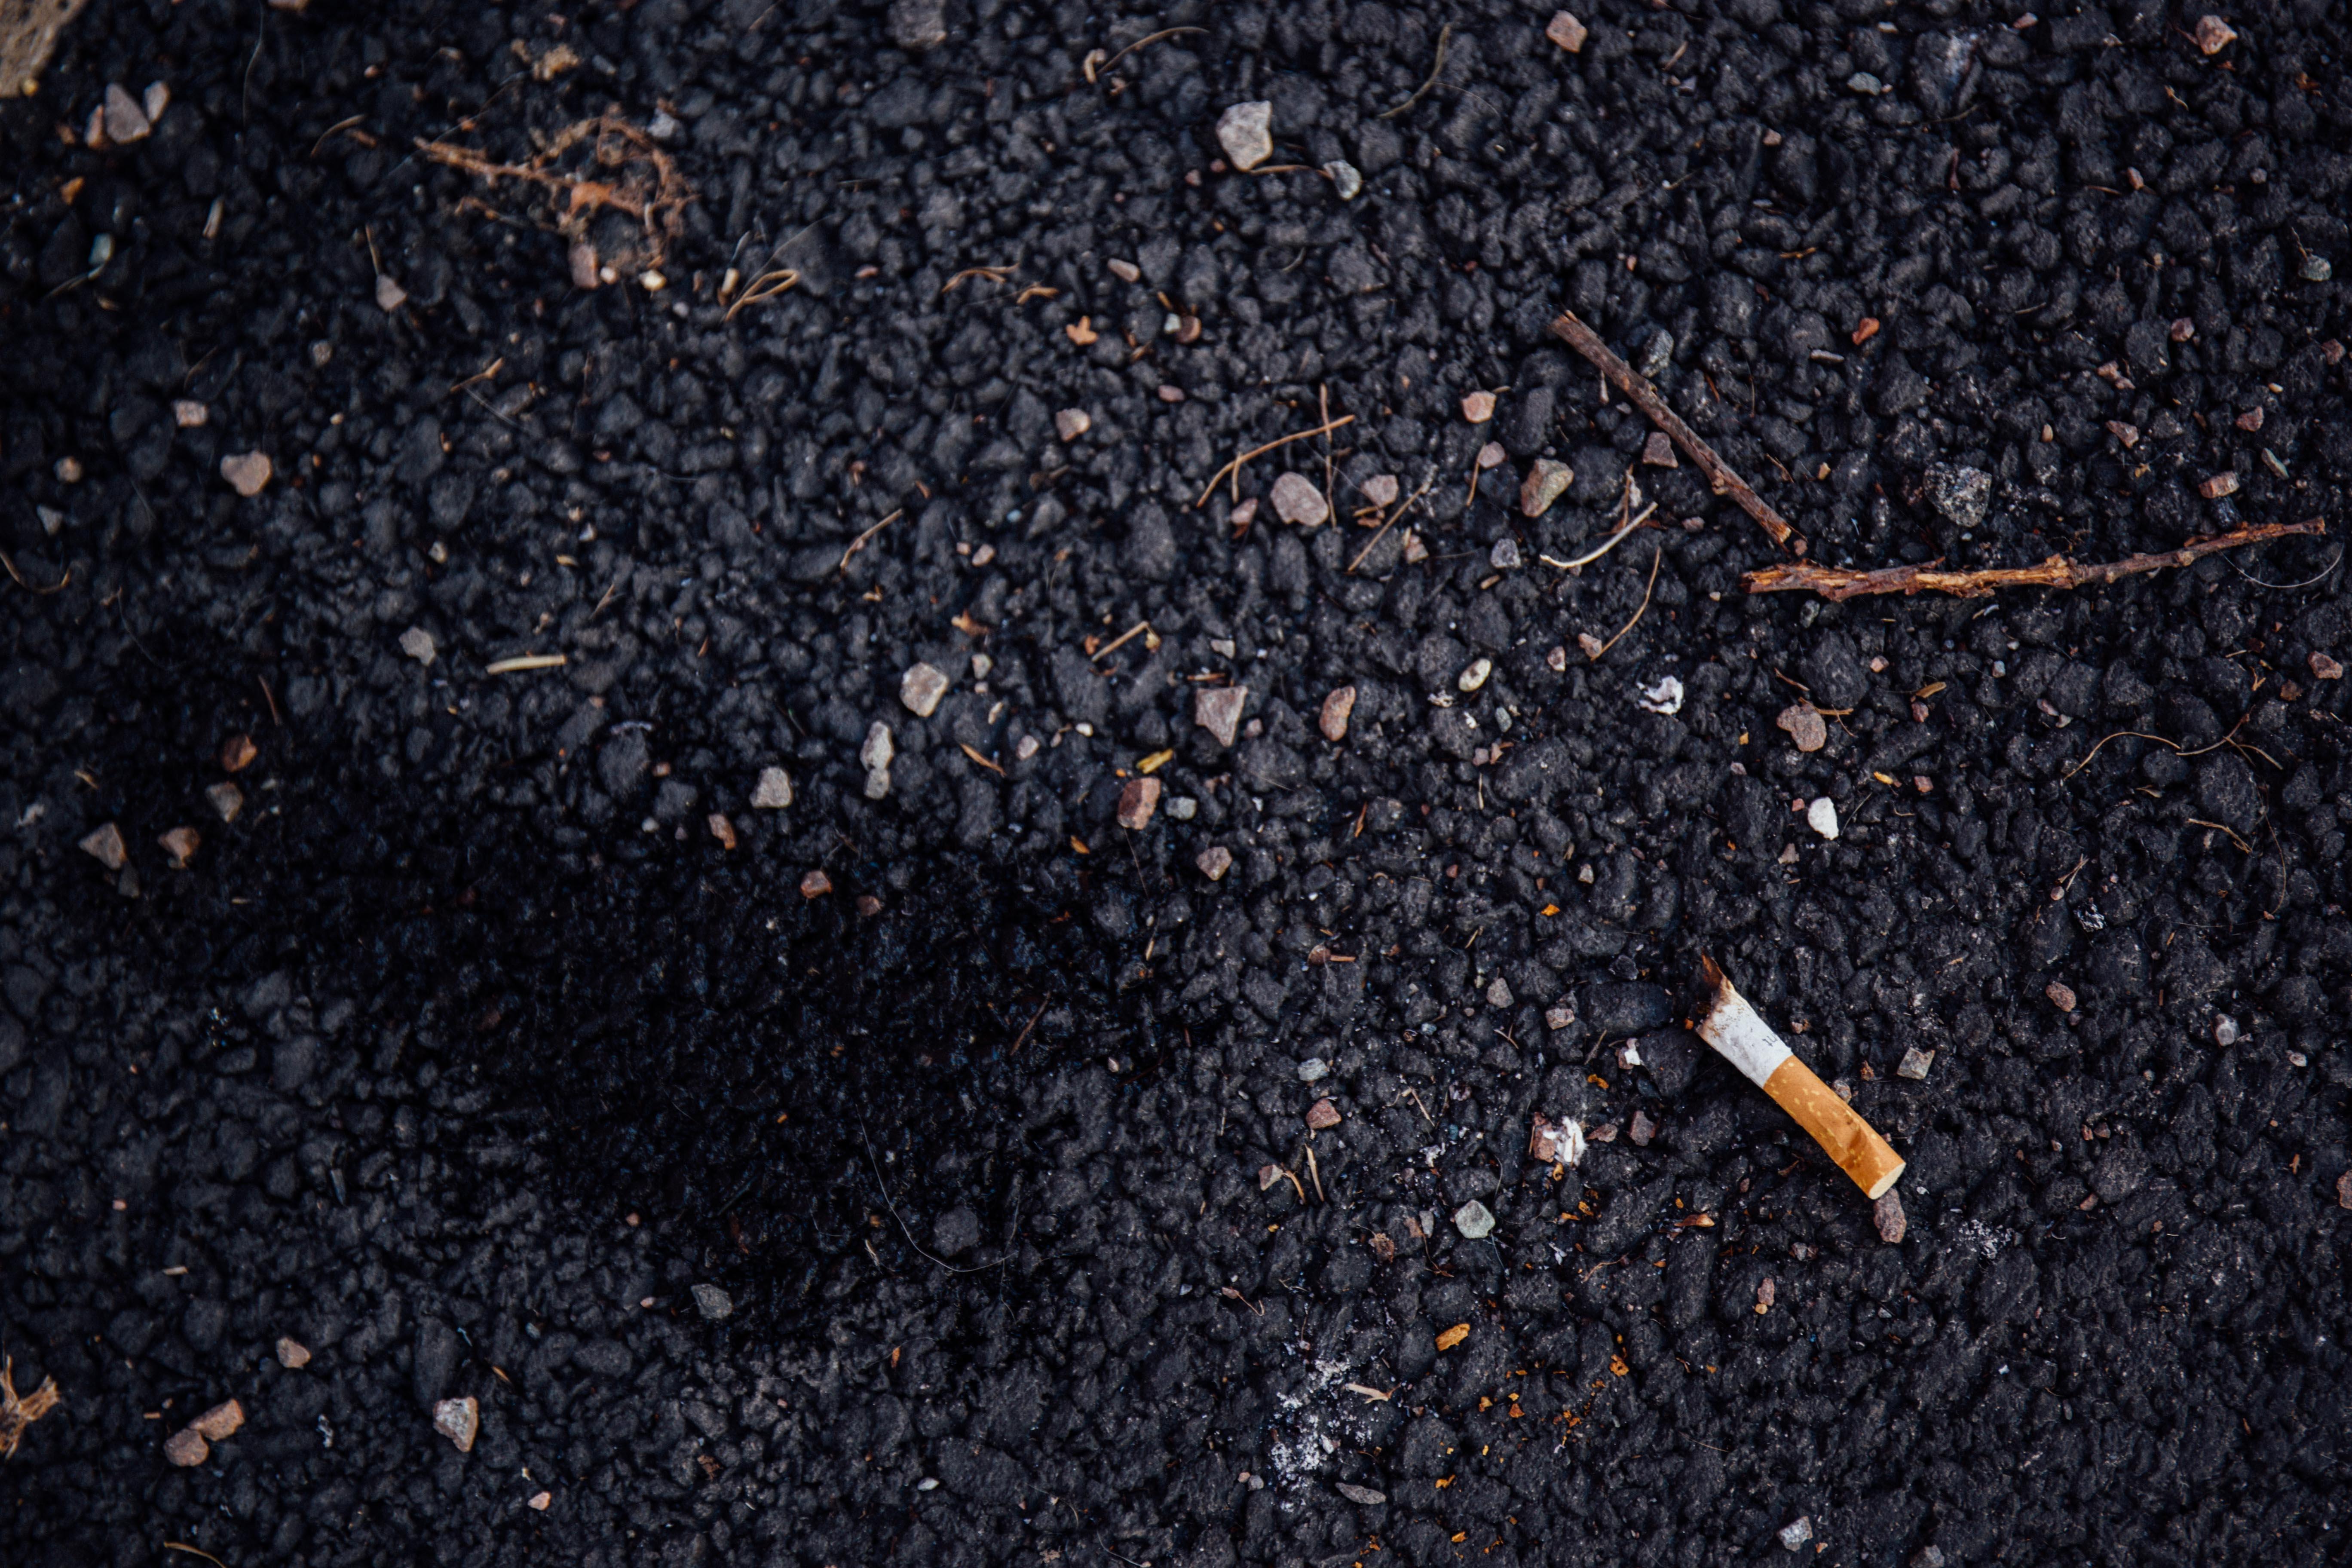 Sigarett på asfalt - Foto Anders Bisgaard